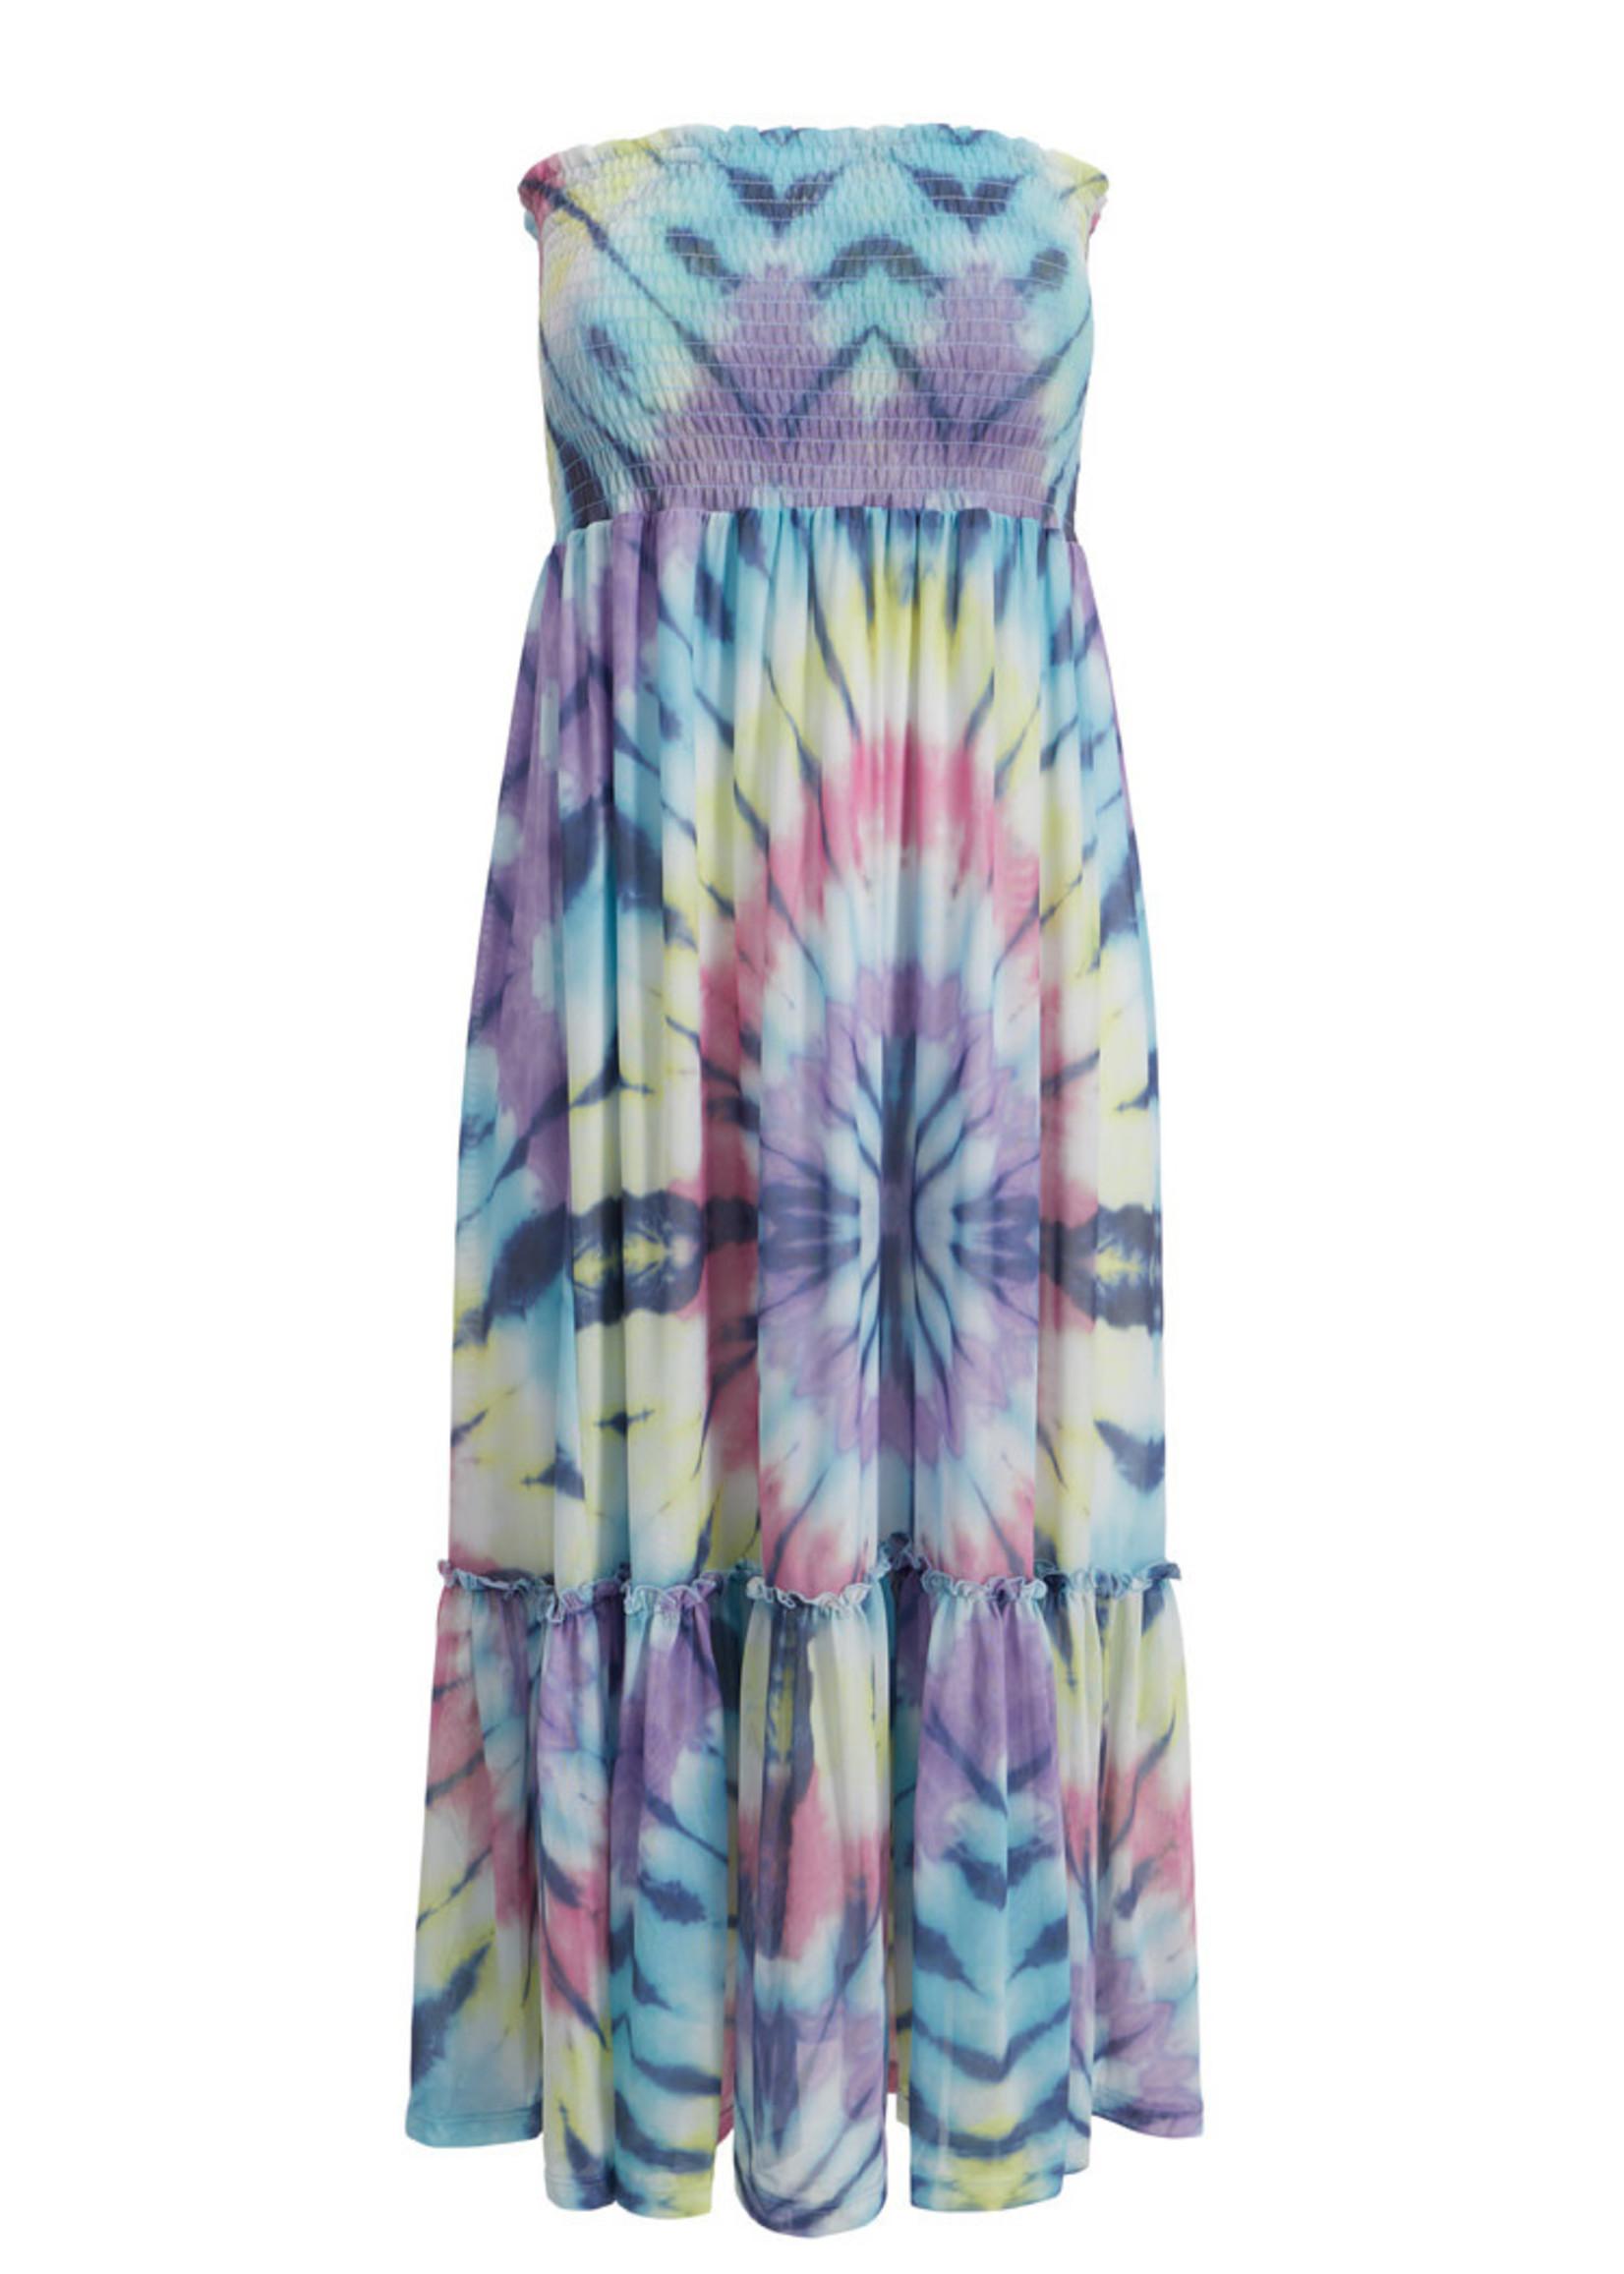 Tribal Wear 2 Ways: Skirt/Dress 65730